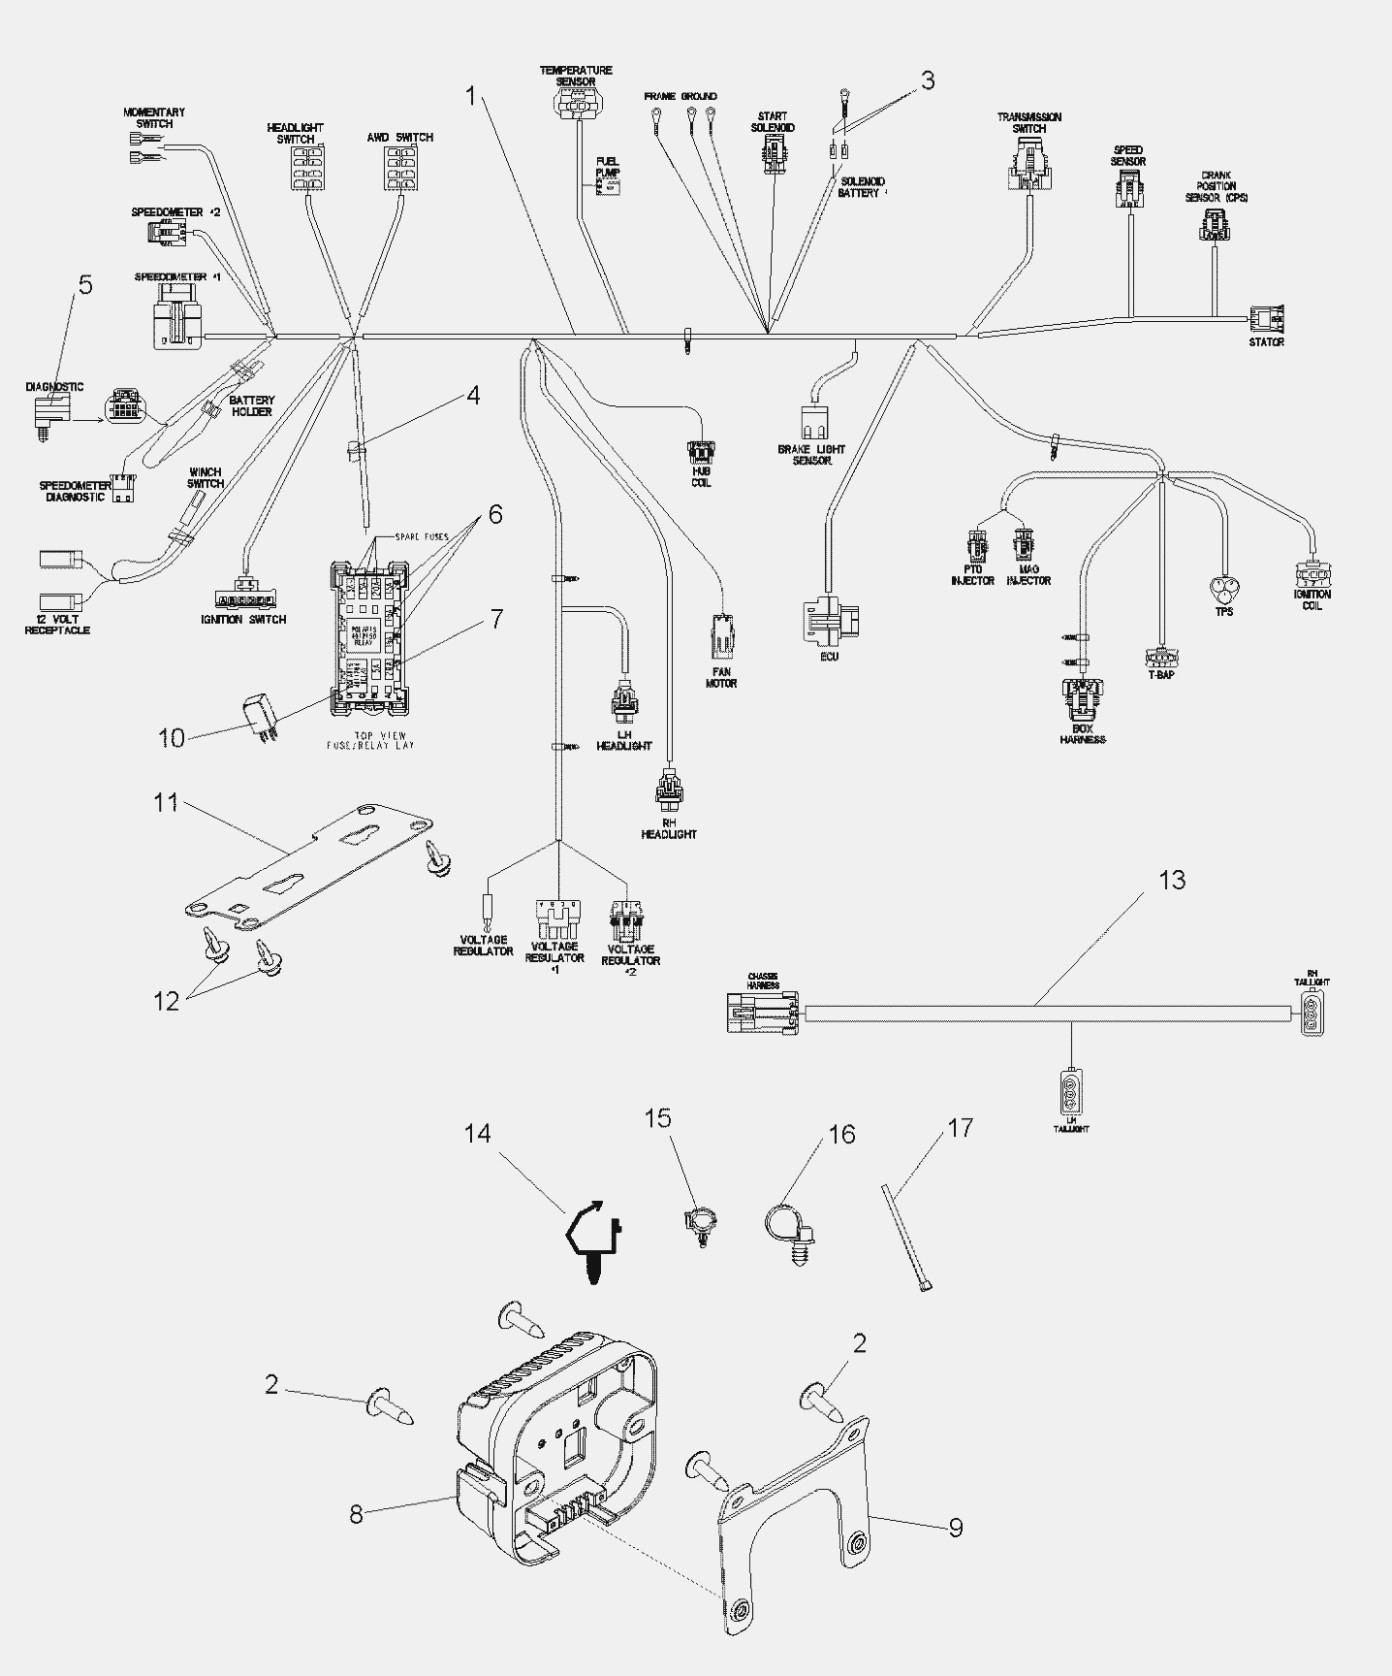 Schema Electrique Polaris Rzr 800